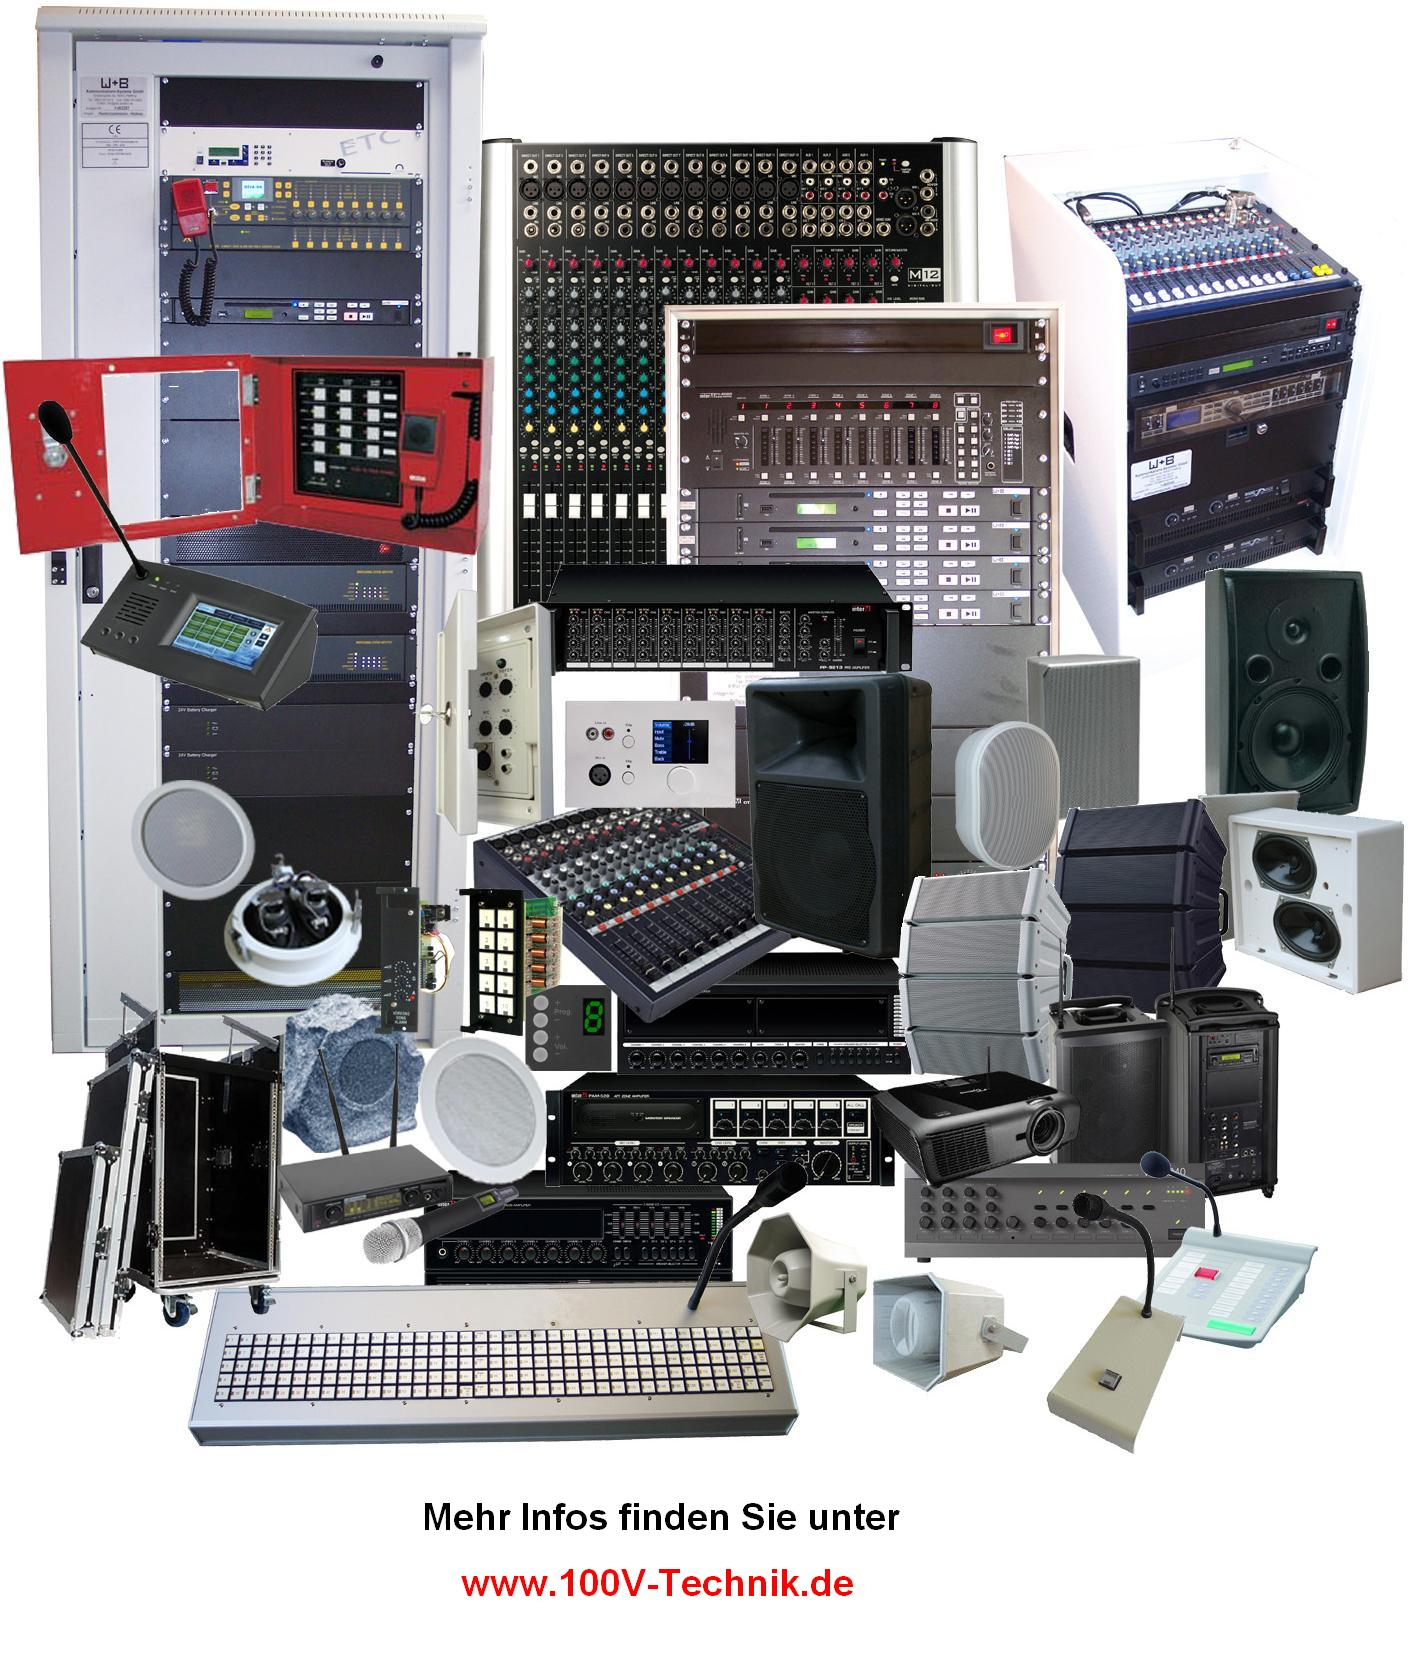 W+B Kommunikations-Systeme GmbH